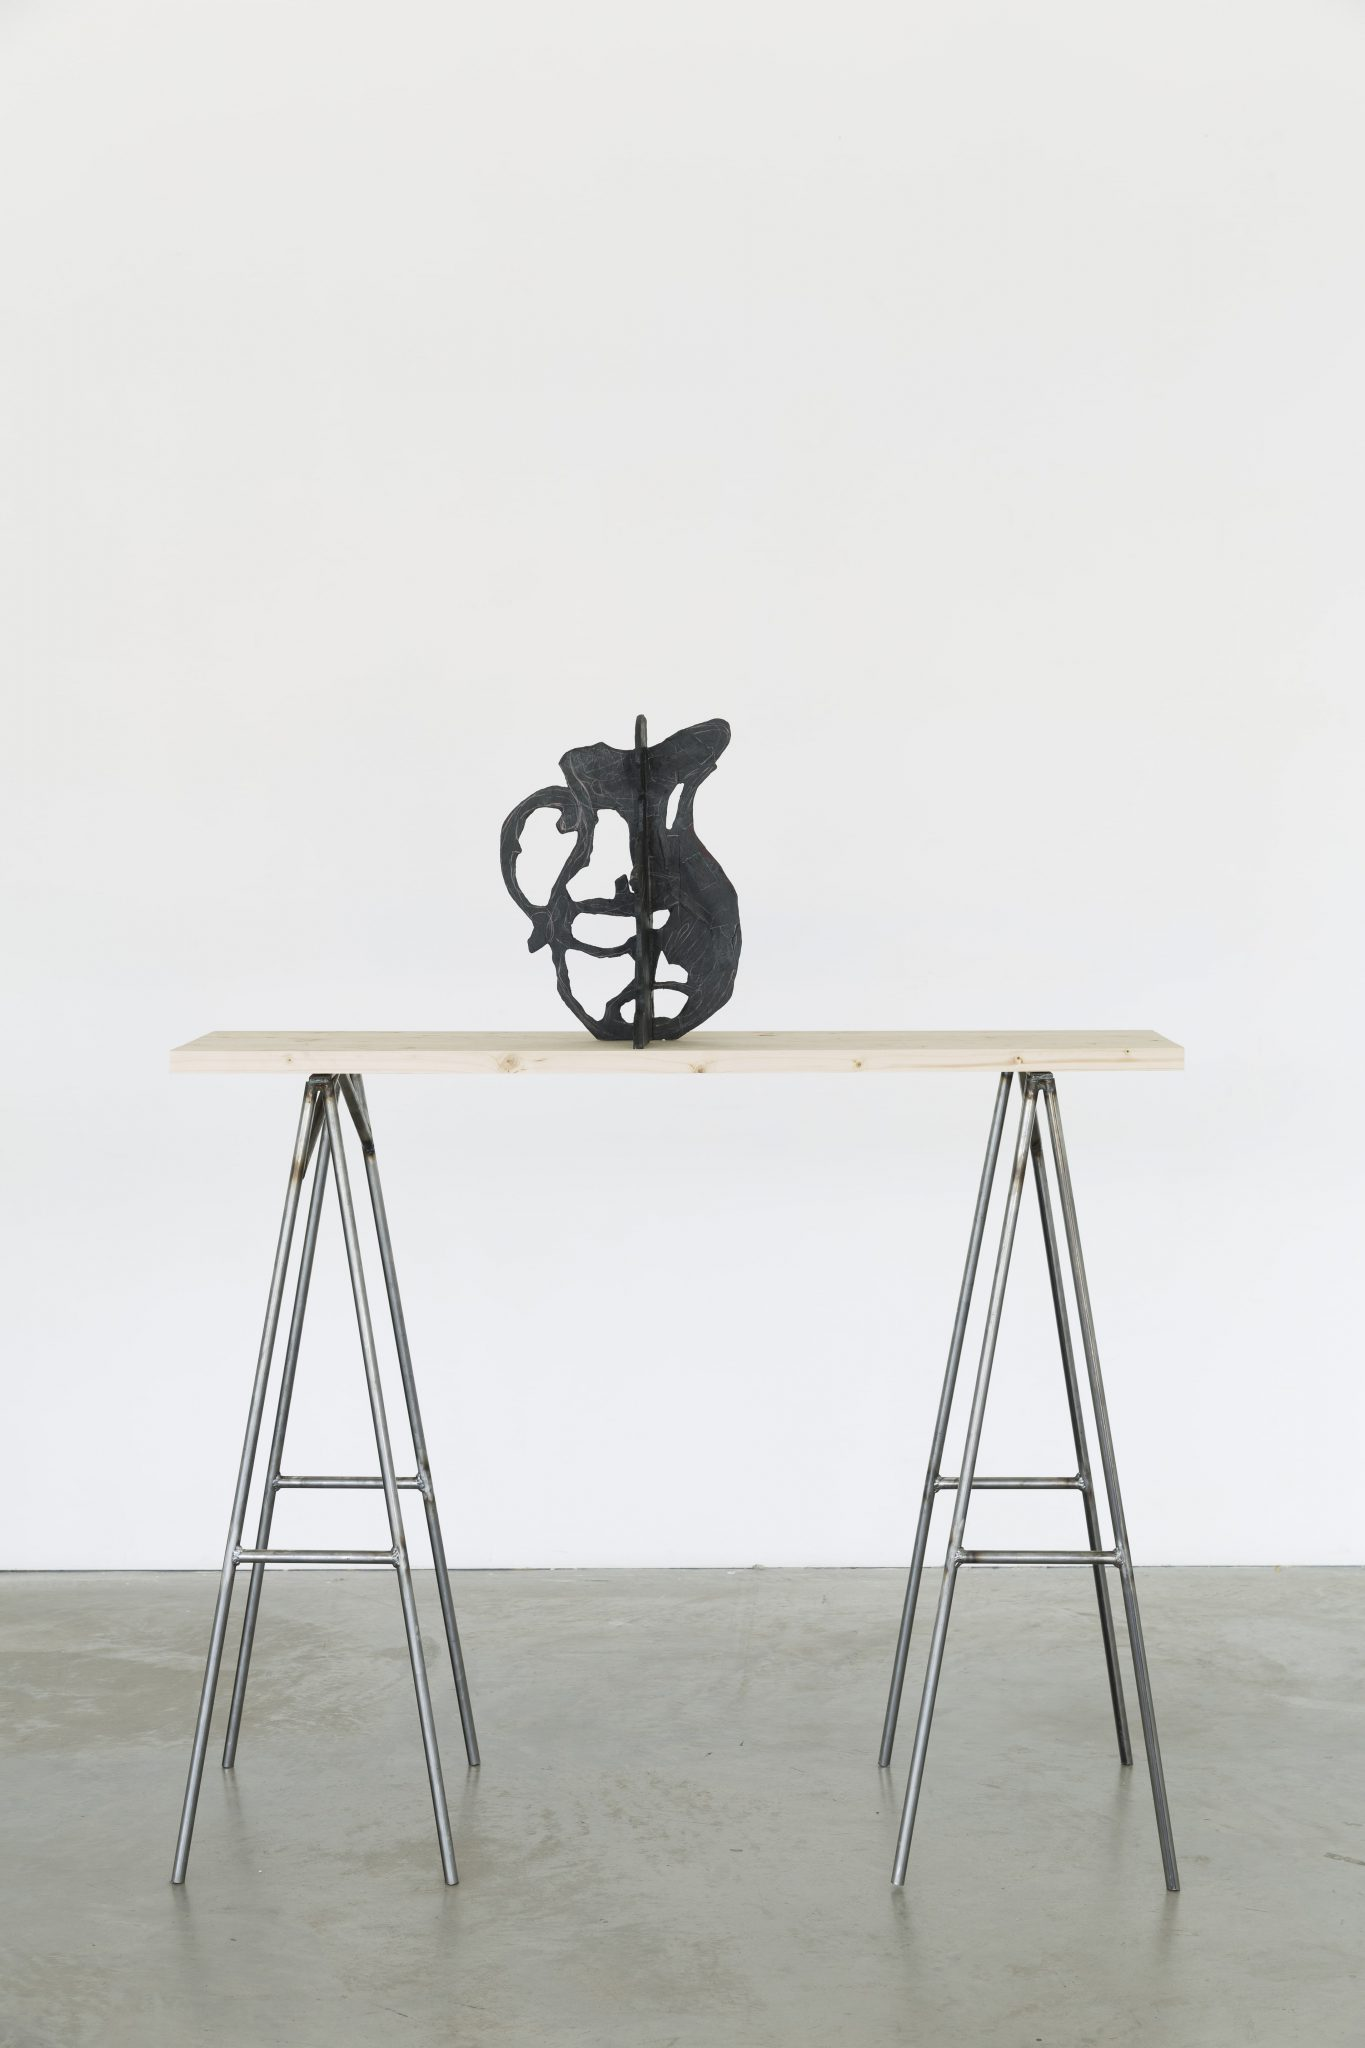 William Kentridge, Shadow Figure III, 2016, Bronze, 30 x 42 x 26 cm